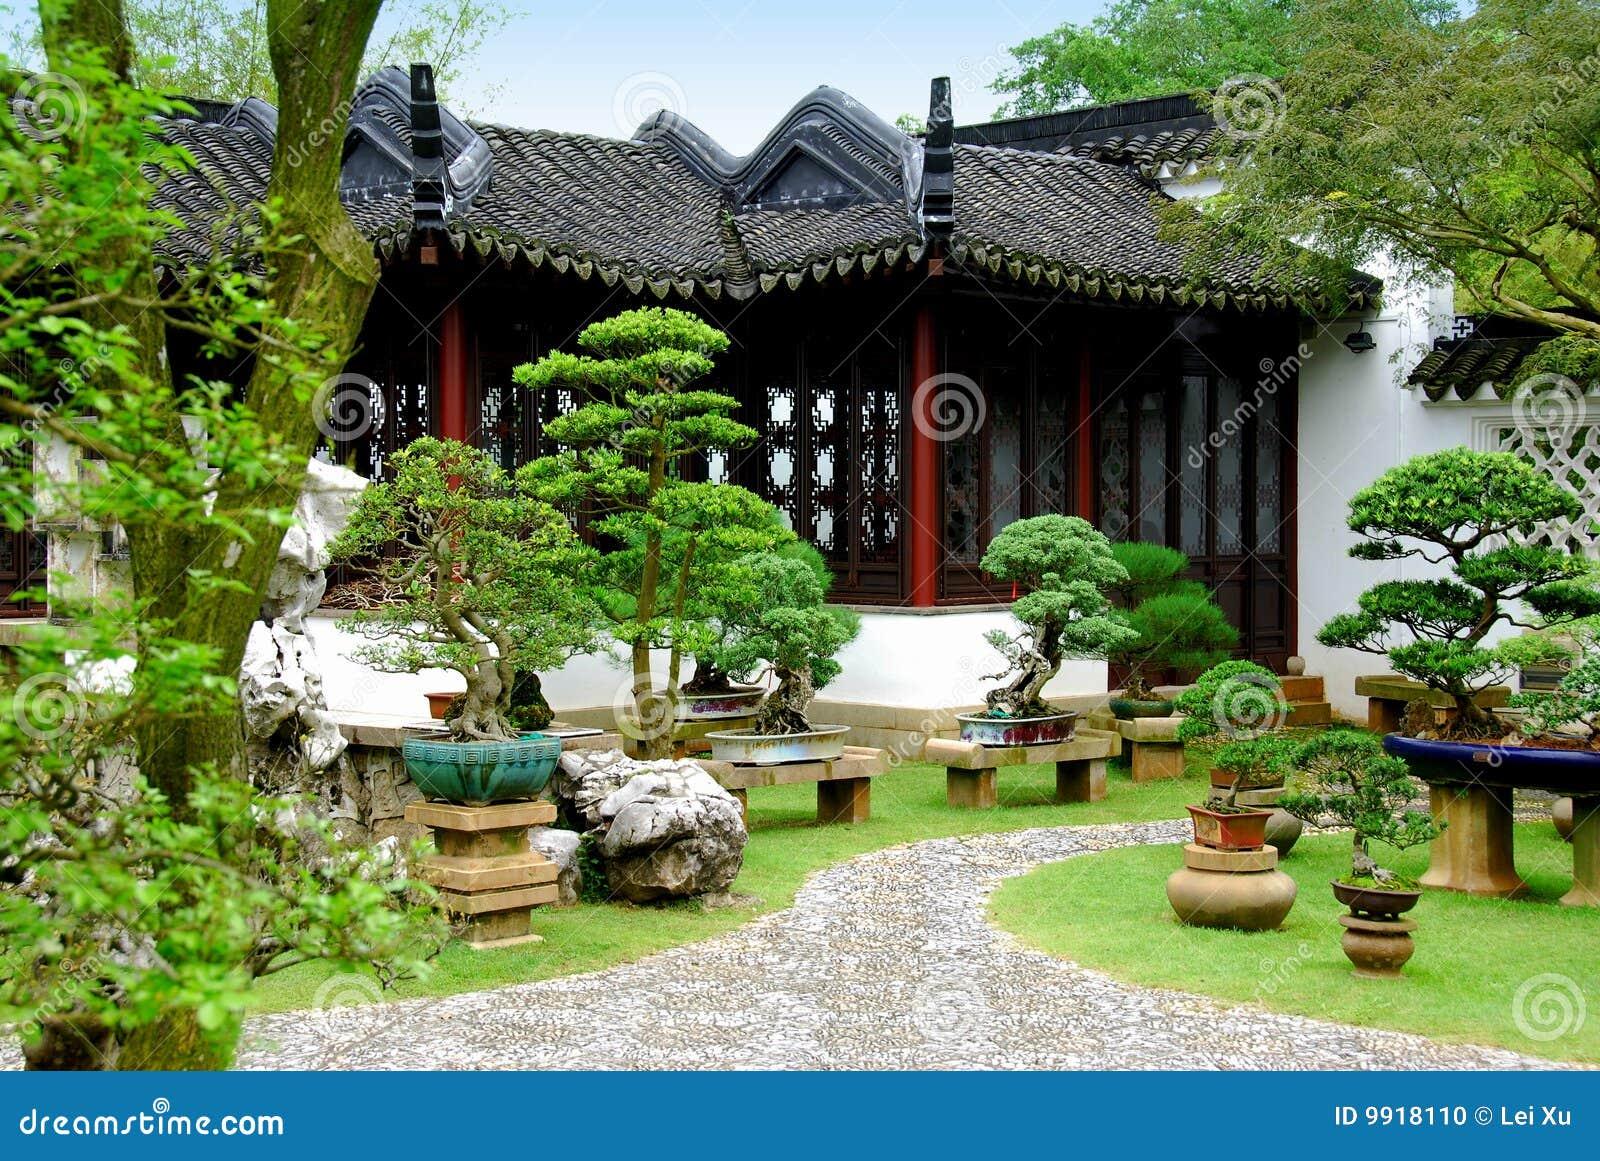 Singapore bonsai at the chinese garden stock photo for Imagenes de jardines exoticos